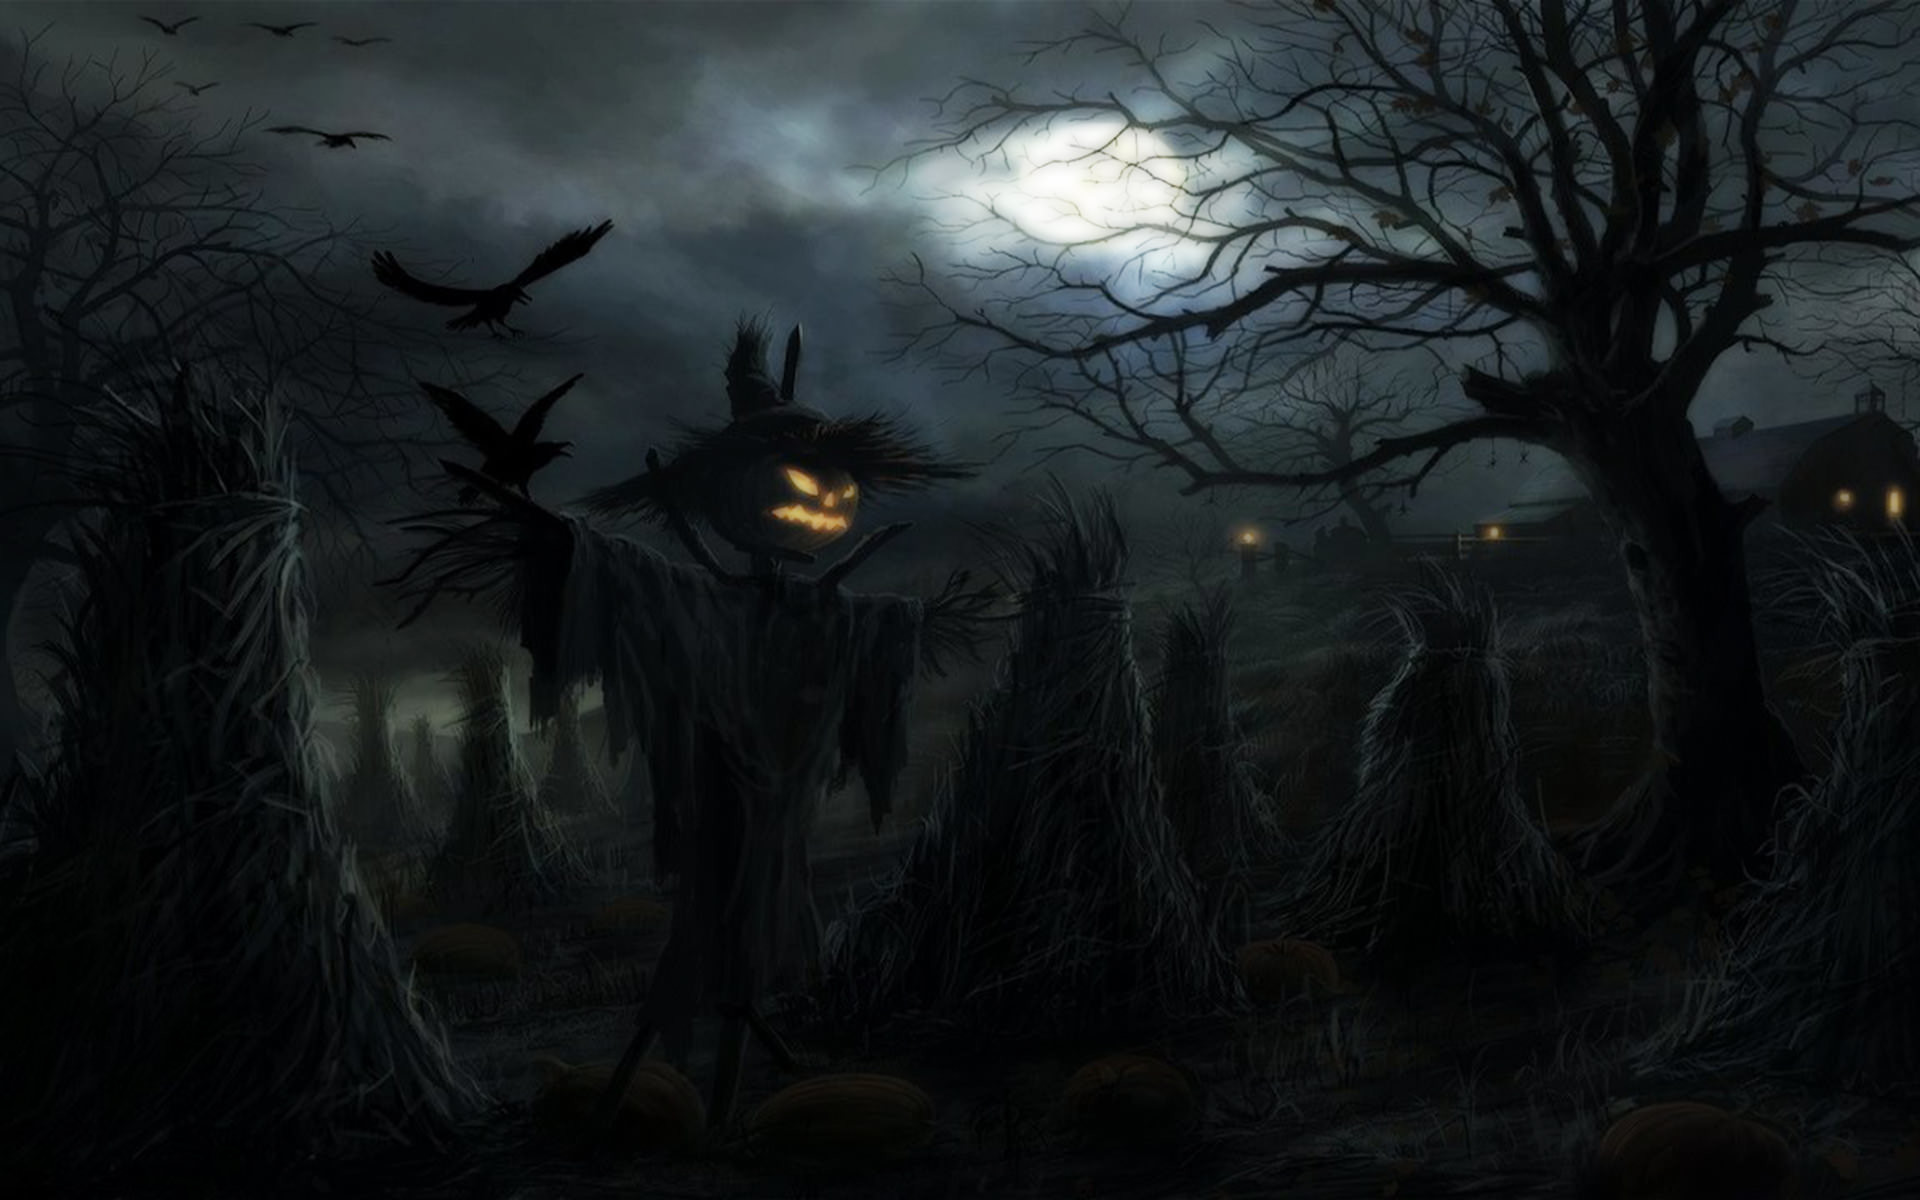 Scary Forest Wallpaper – WallpaperSafari